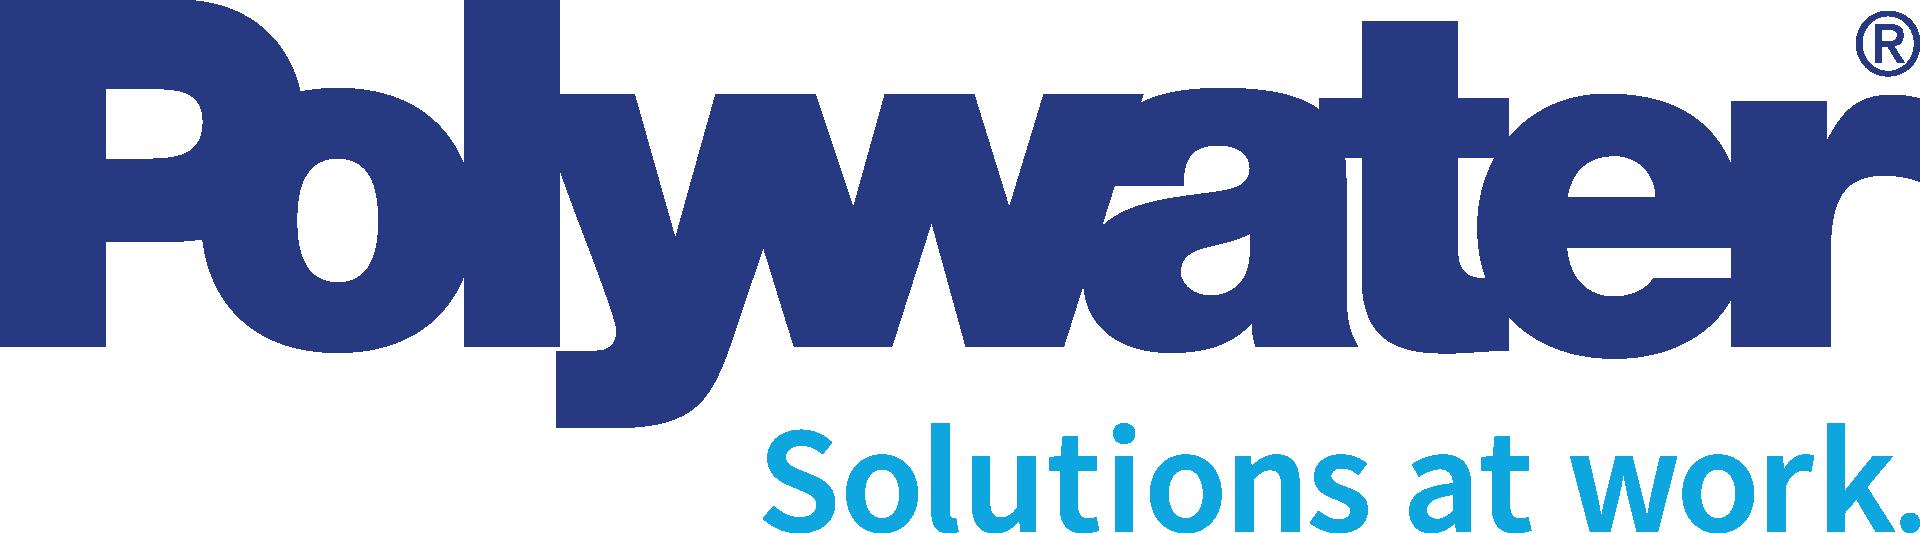 Polywater Logo_wTagline_RGB_2color